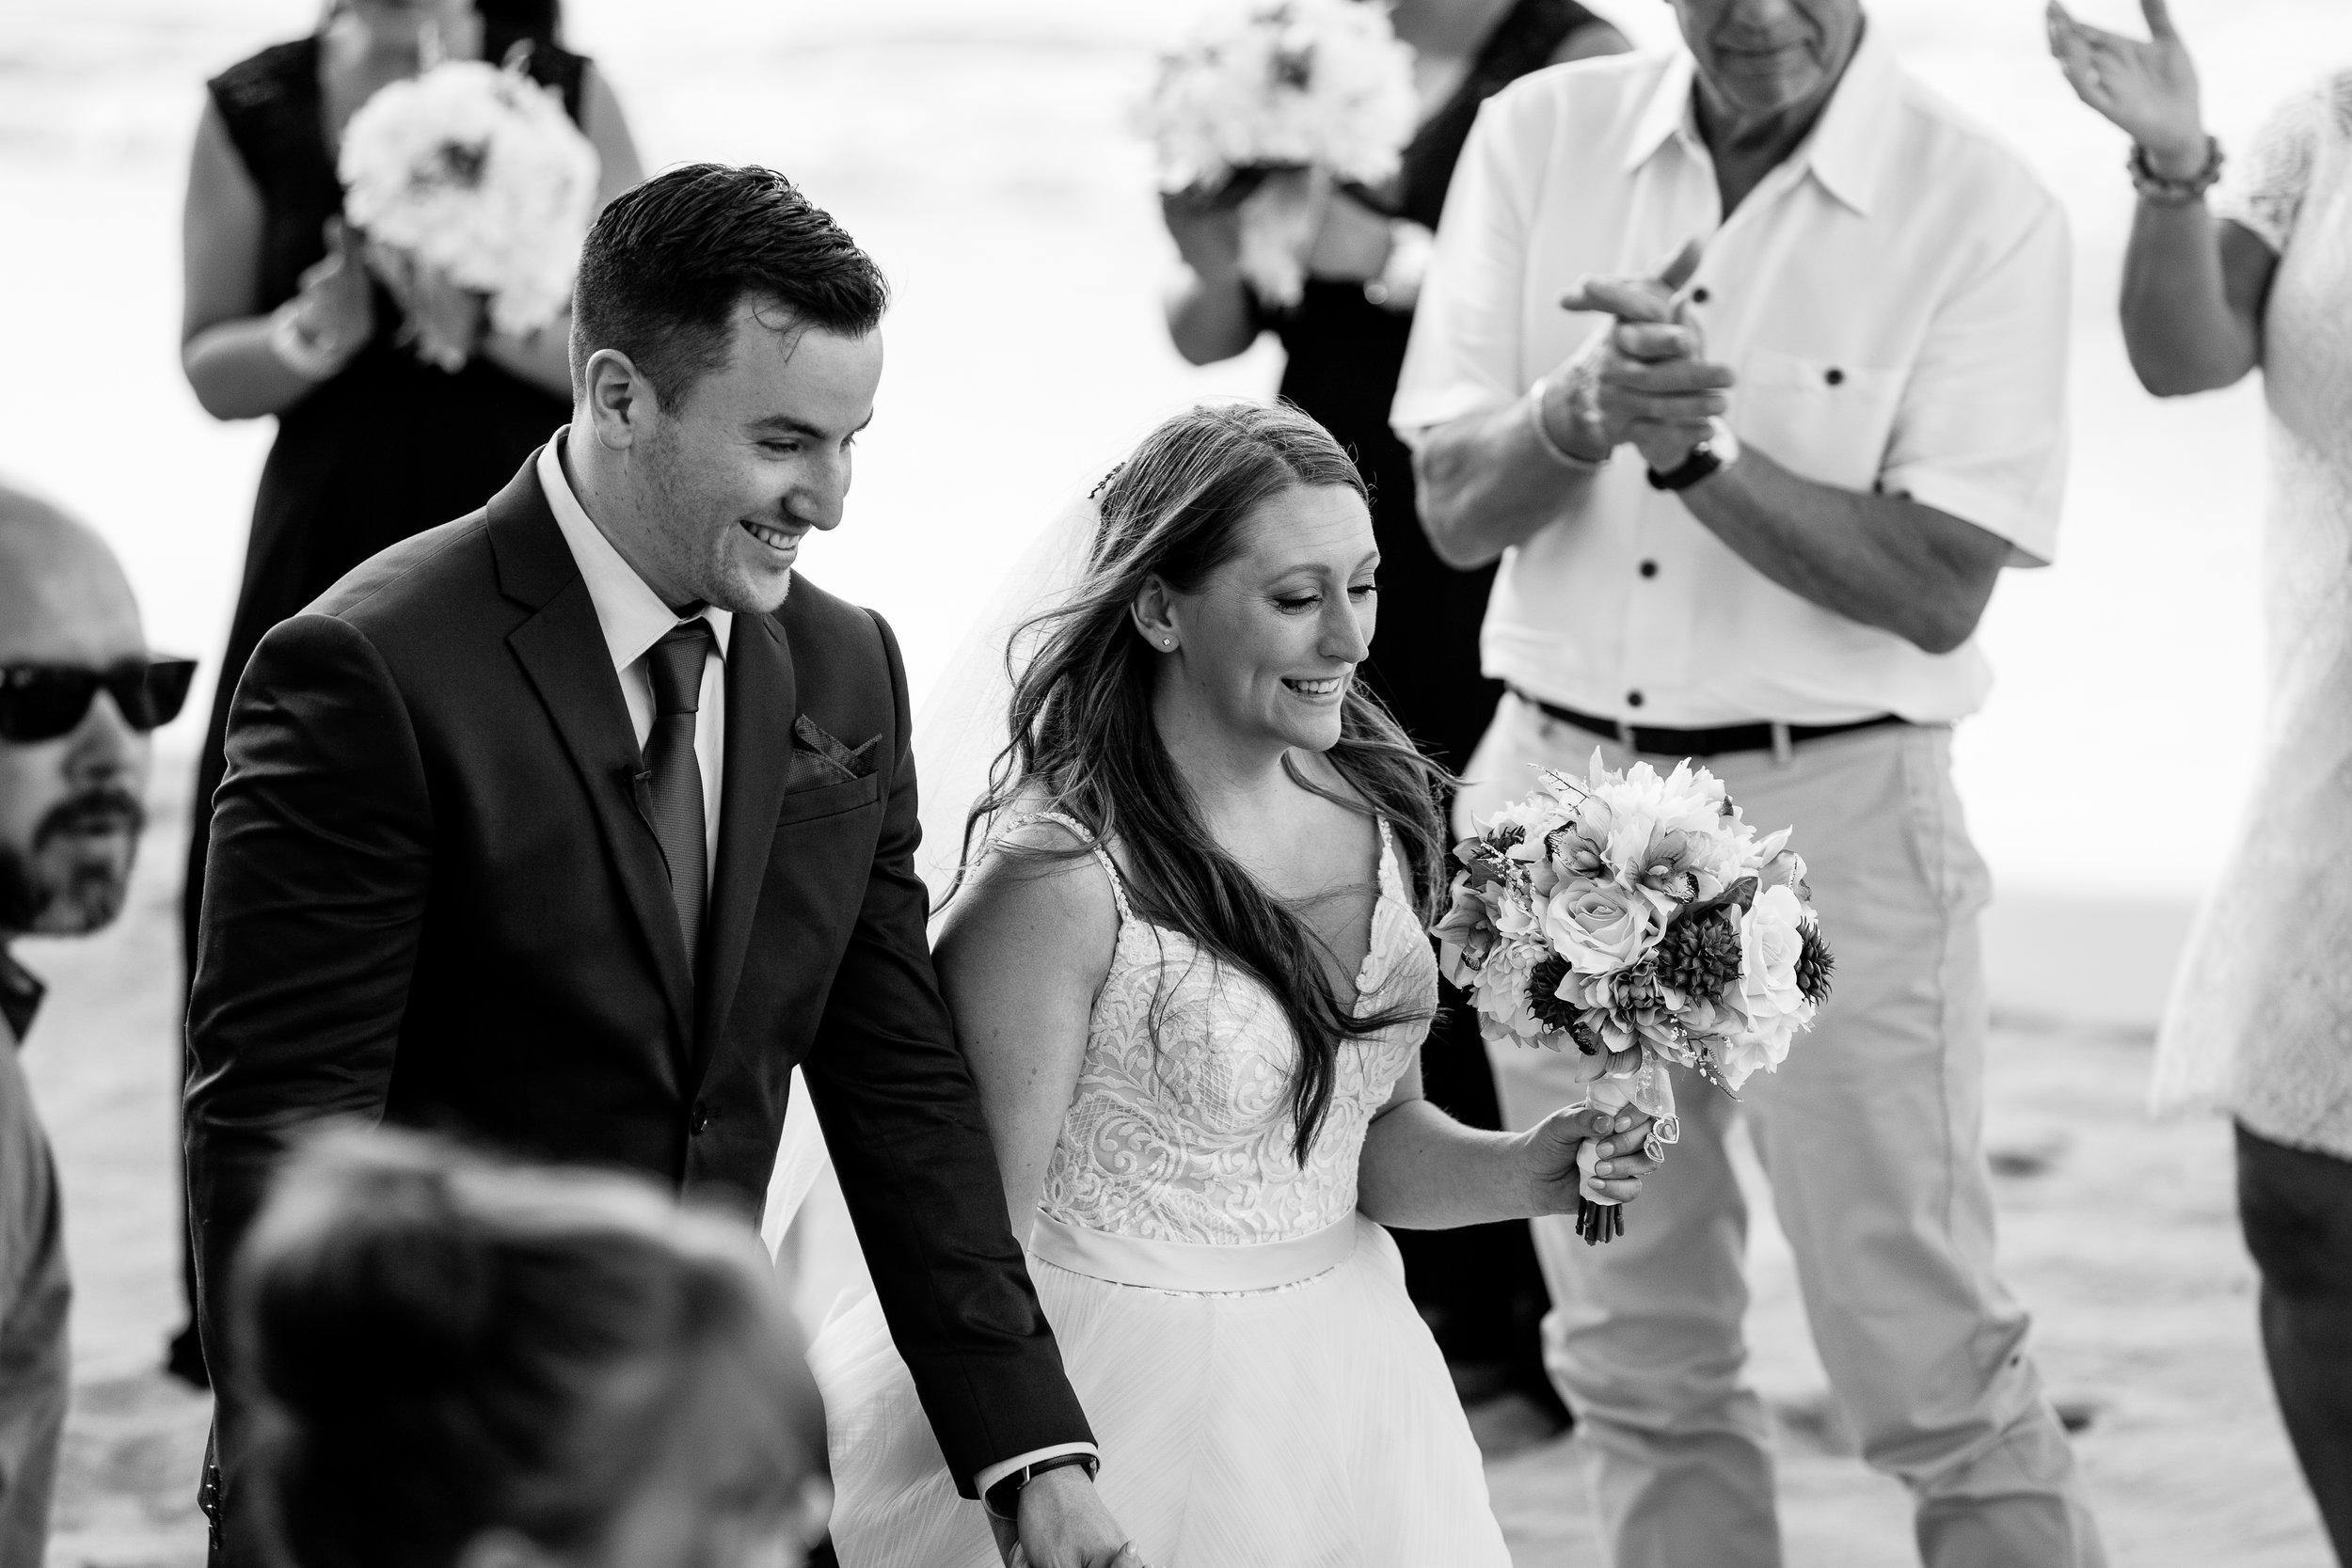 nicole-daacke-photography-destination-wedding-in-st-lucia-sandals-la-toc-intimate-island-wedding-carribean-elopement-photographer-chill-island-wedding-73.jpg